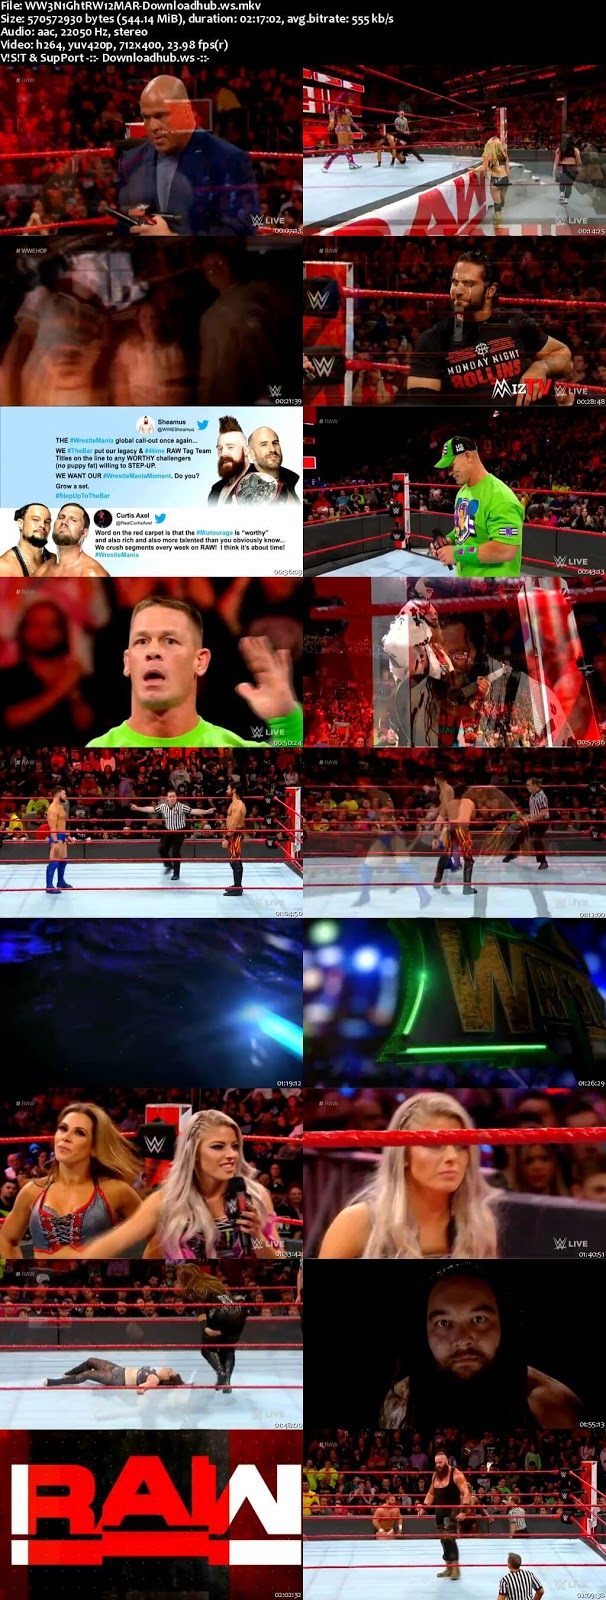 WWE Monday Night Raw 12 March 2018 480p HDTV